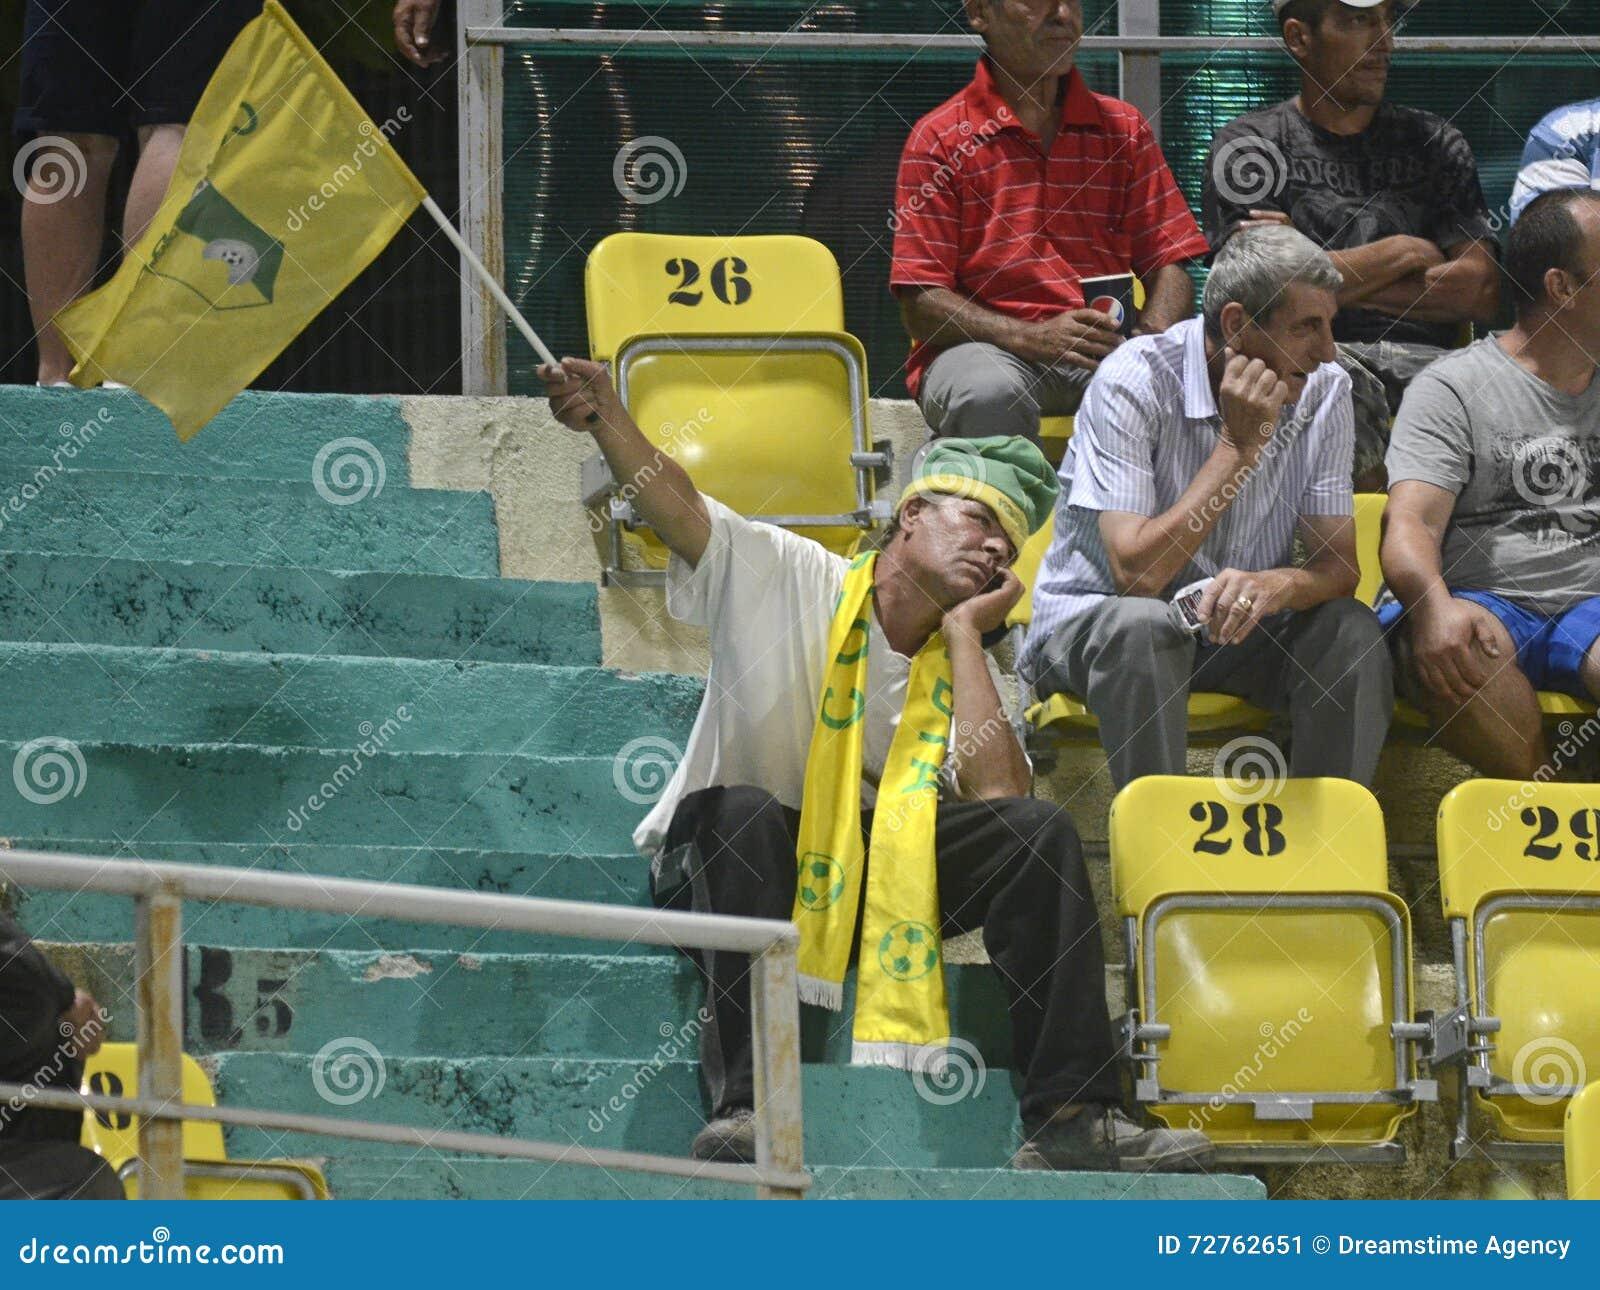 Unusually bored football fan